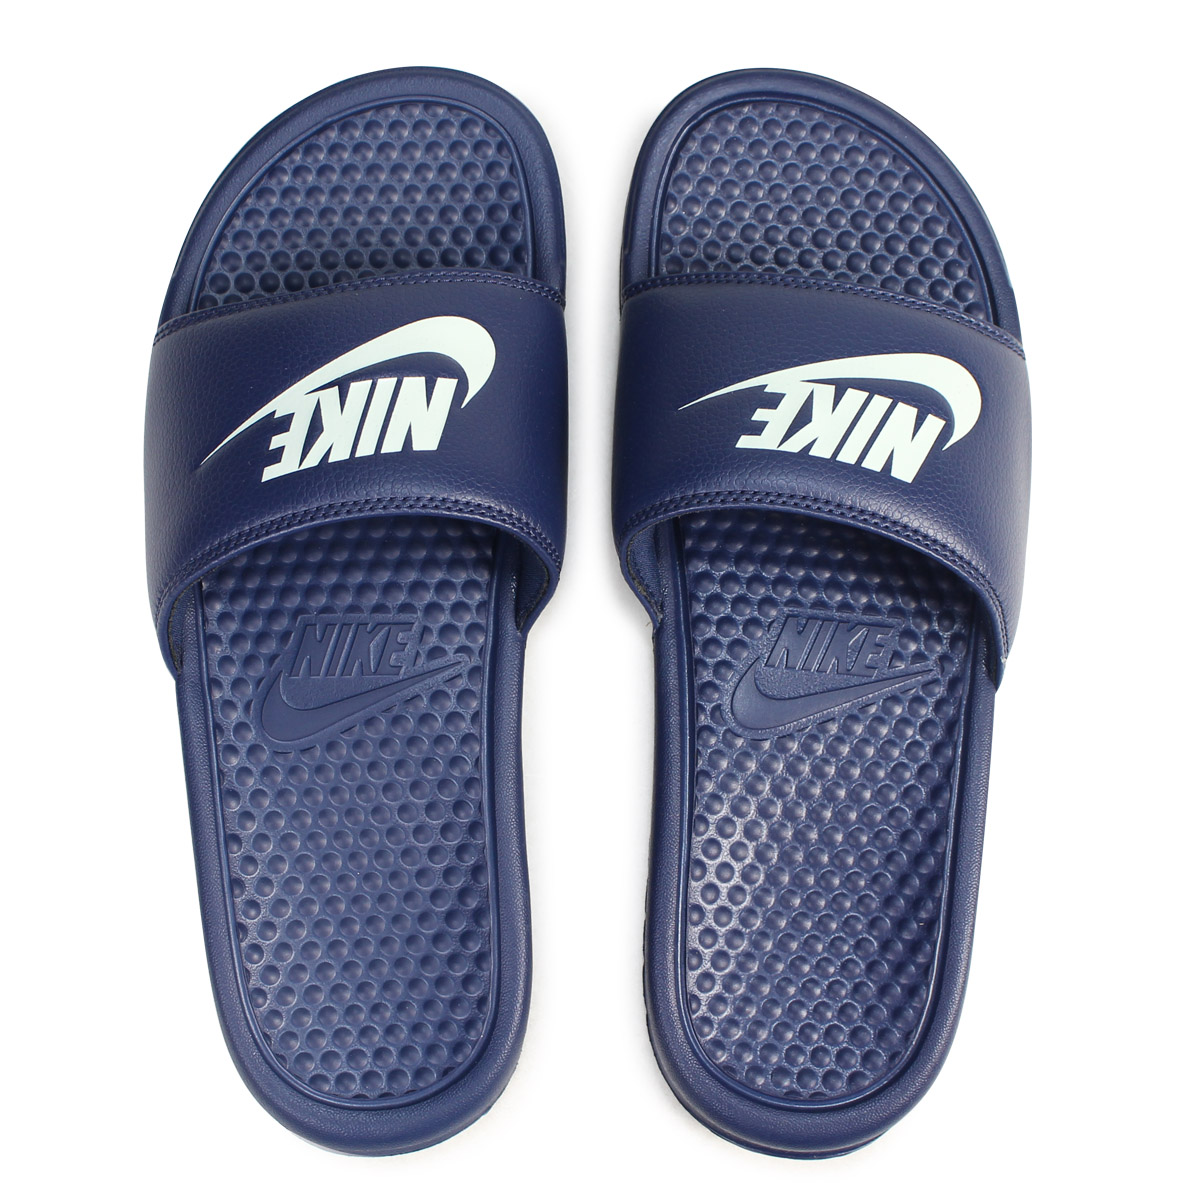 49fcc161b35b Nike NIKE sandals べ ナッシシャワーサンダルスポーツ BENASSI JUST DO IT 343